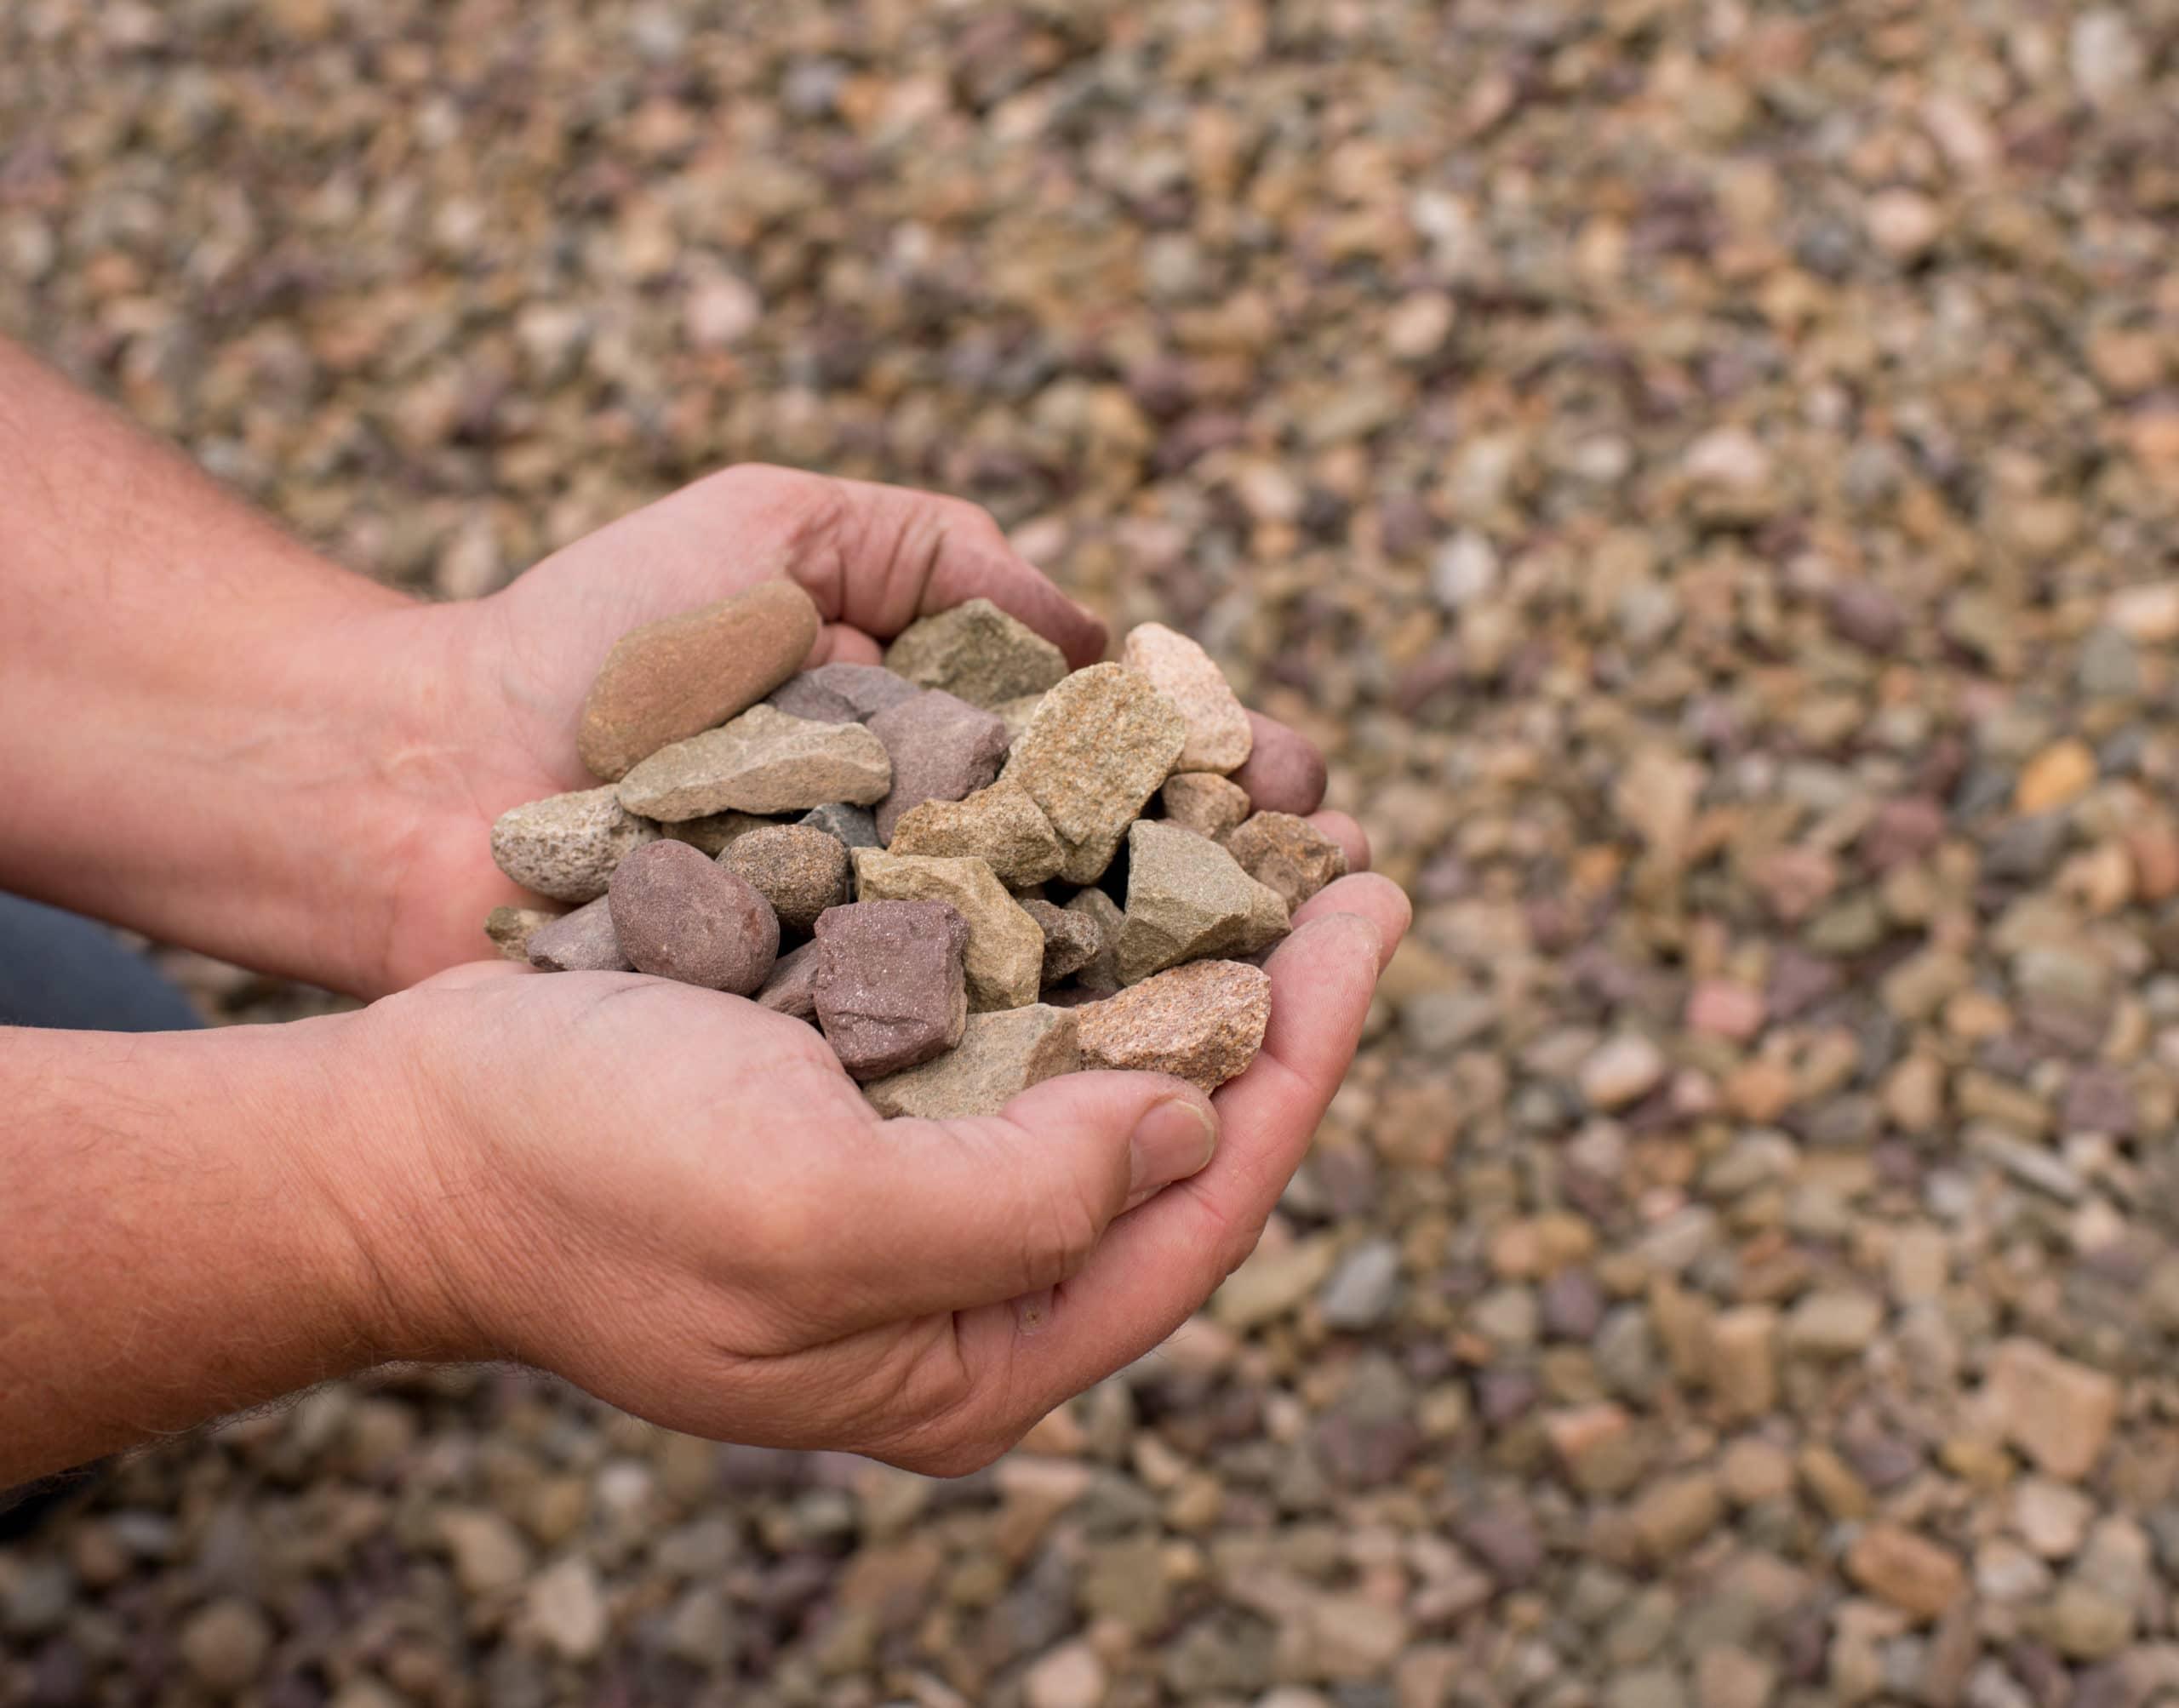 appalachian gravel 0.75 inch